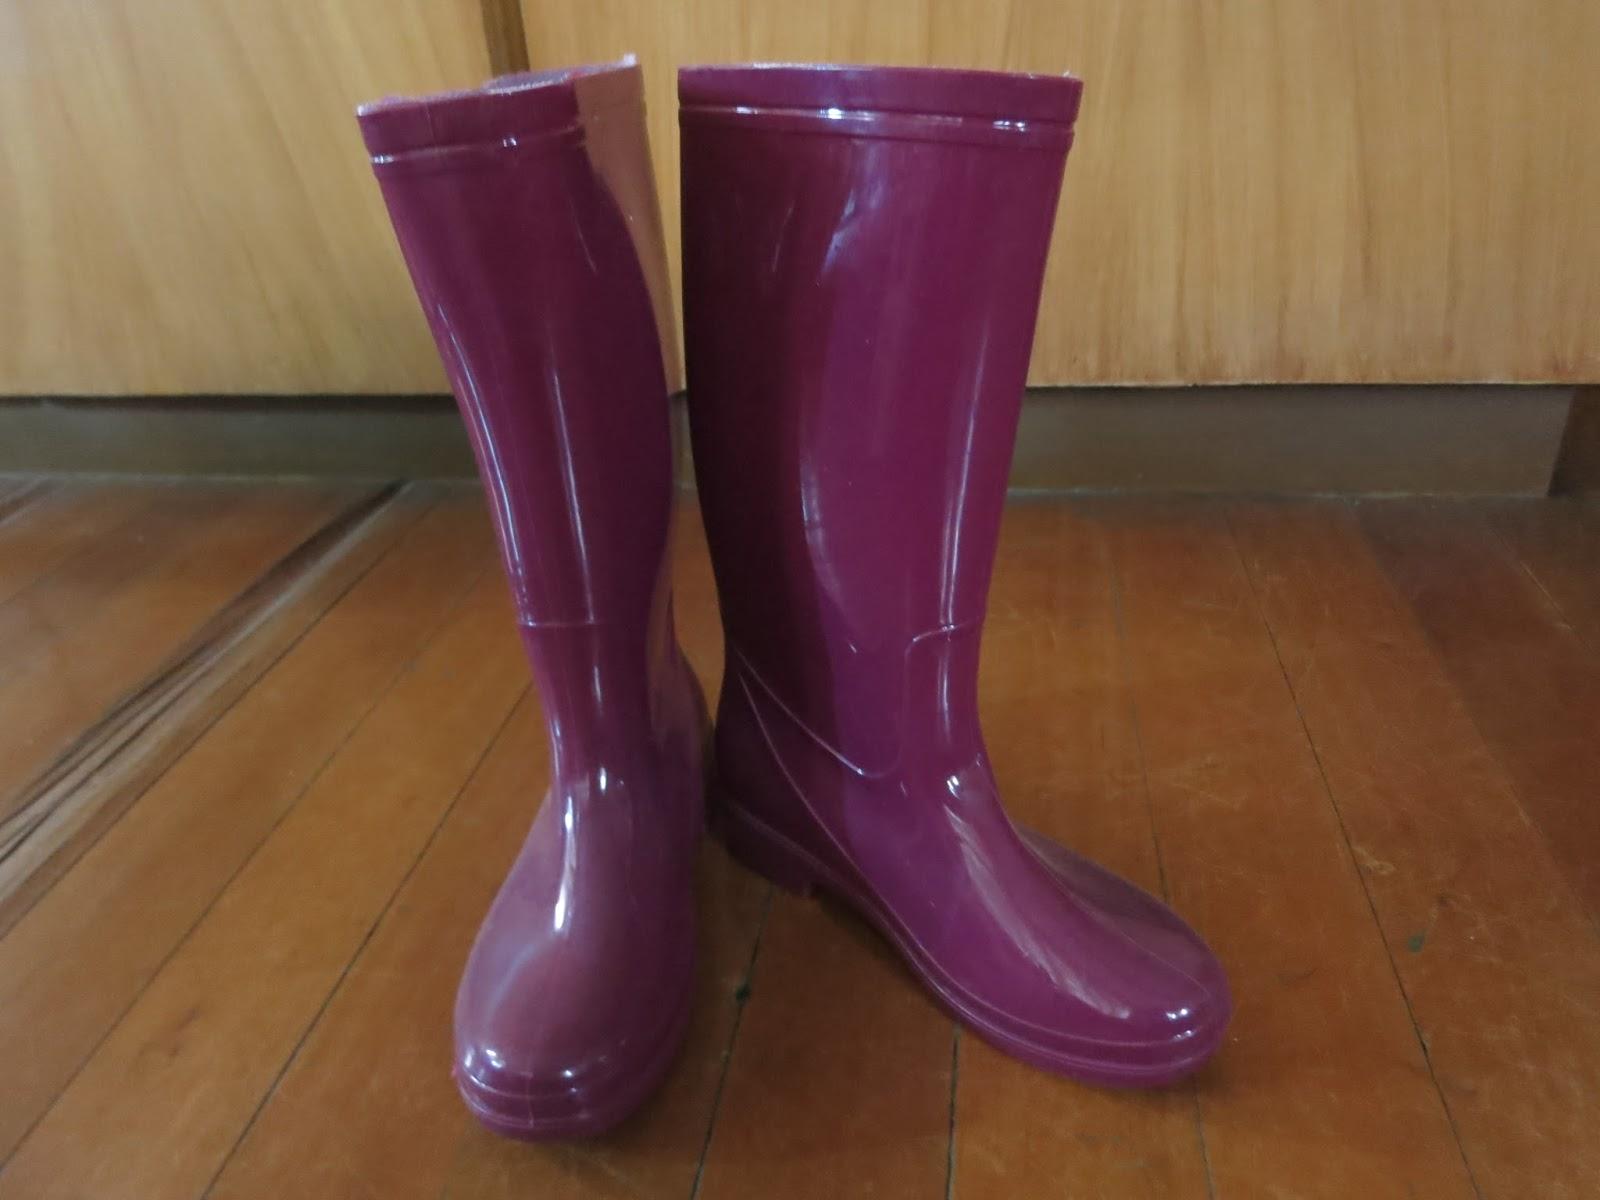 Mineeh11: Perfect Rain Boots